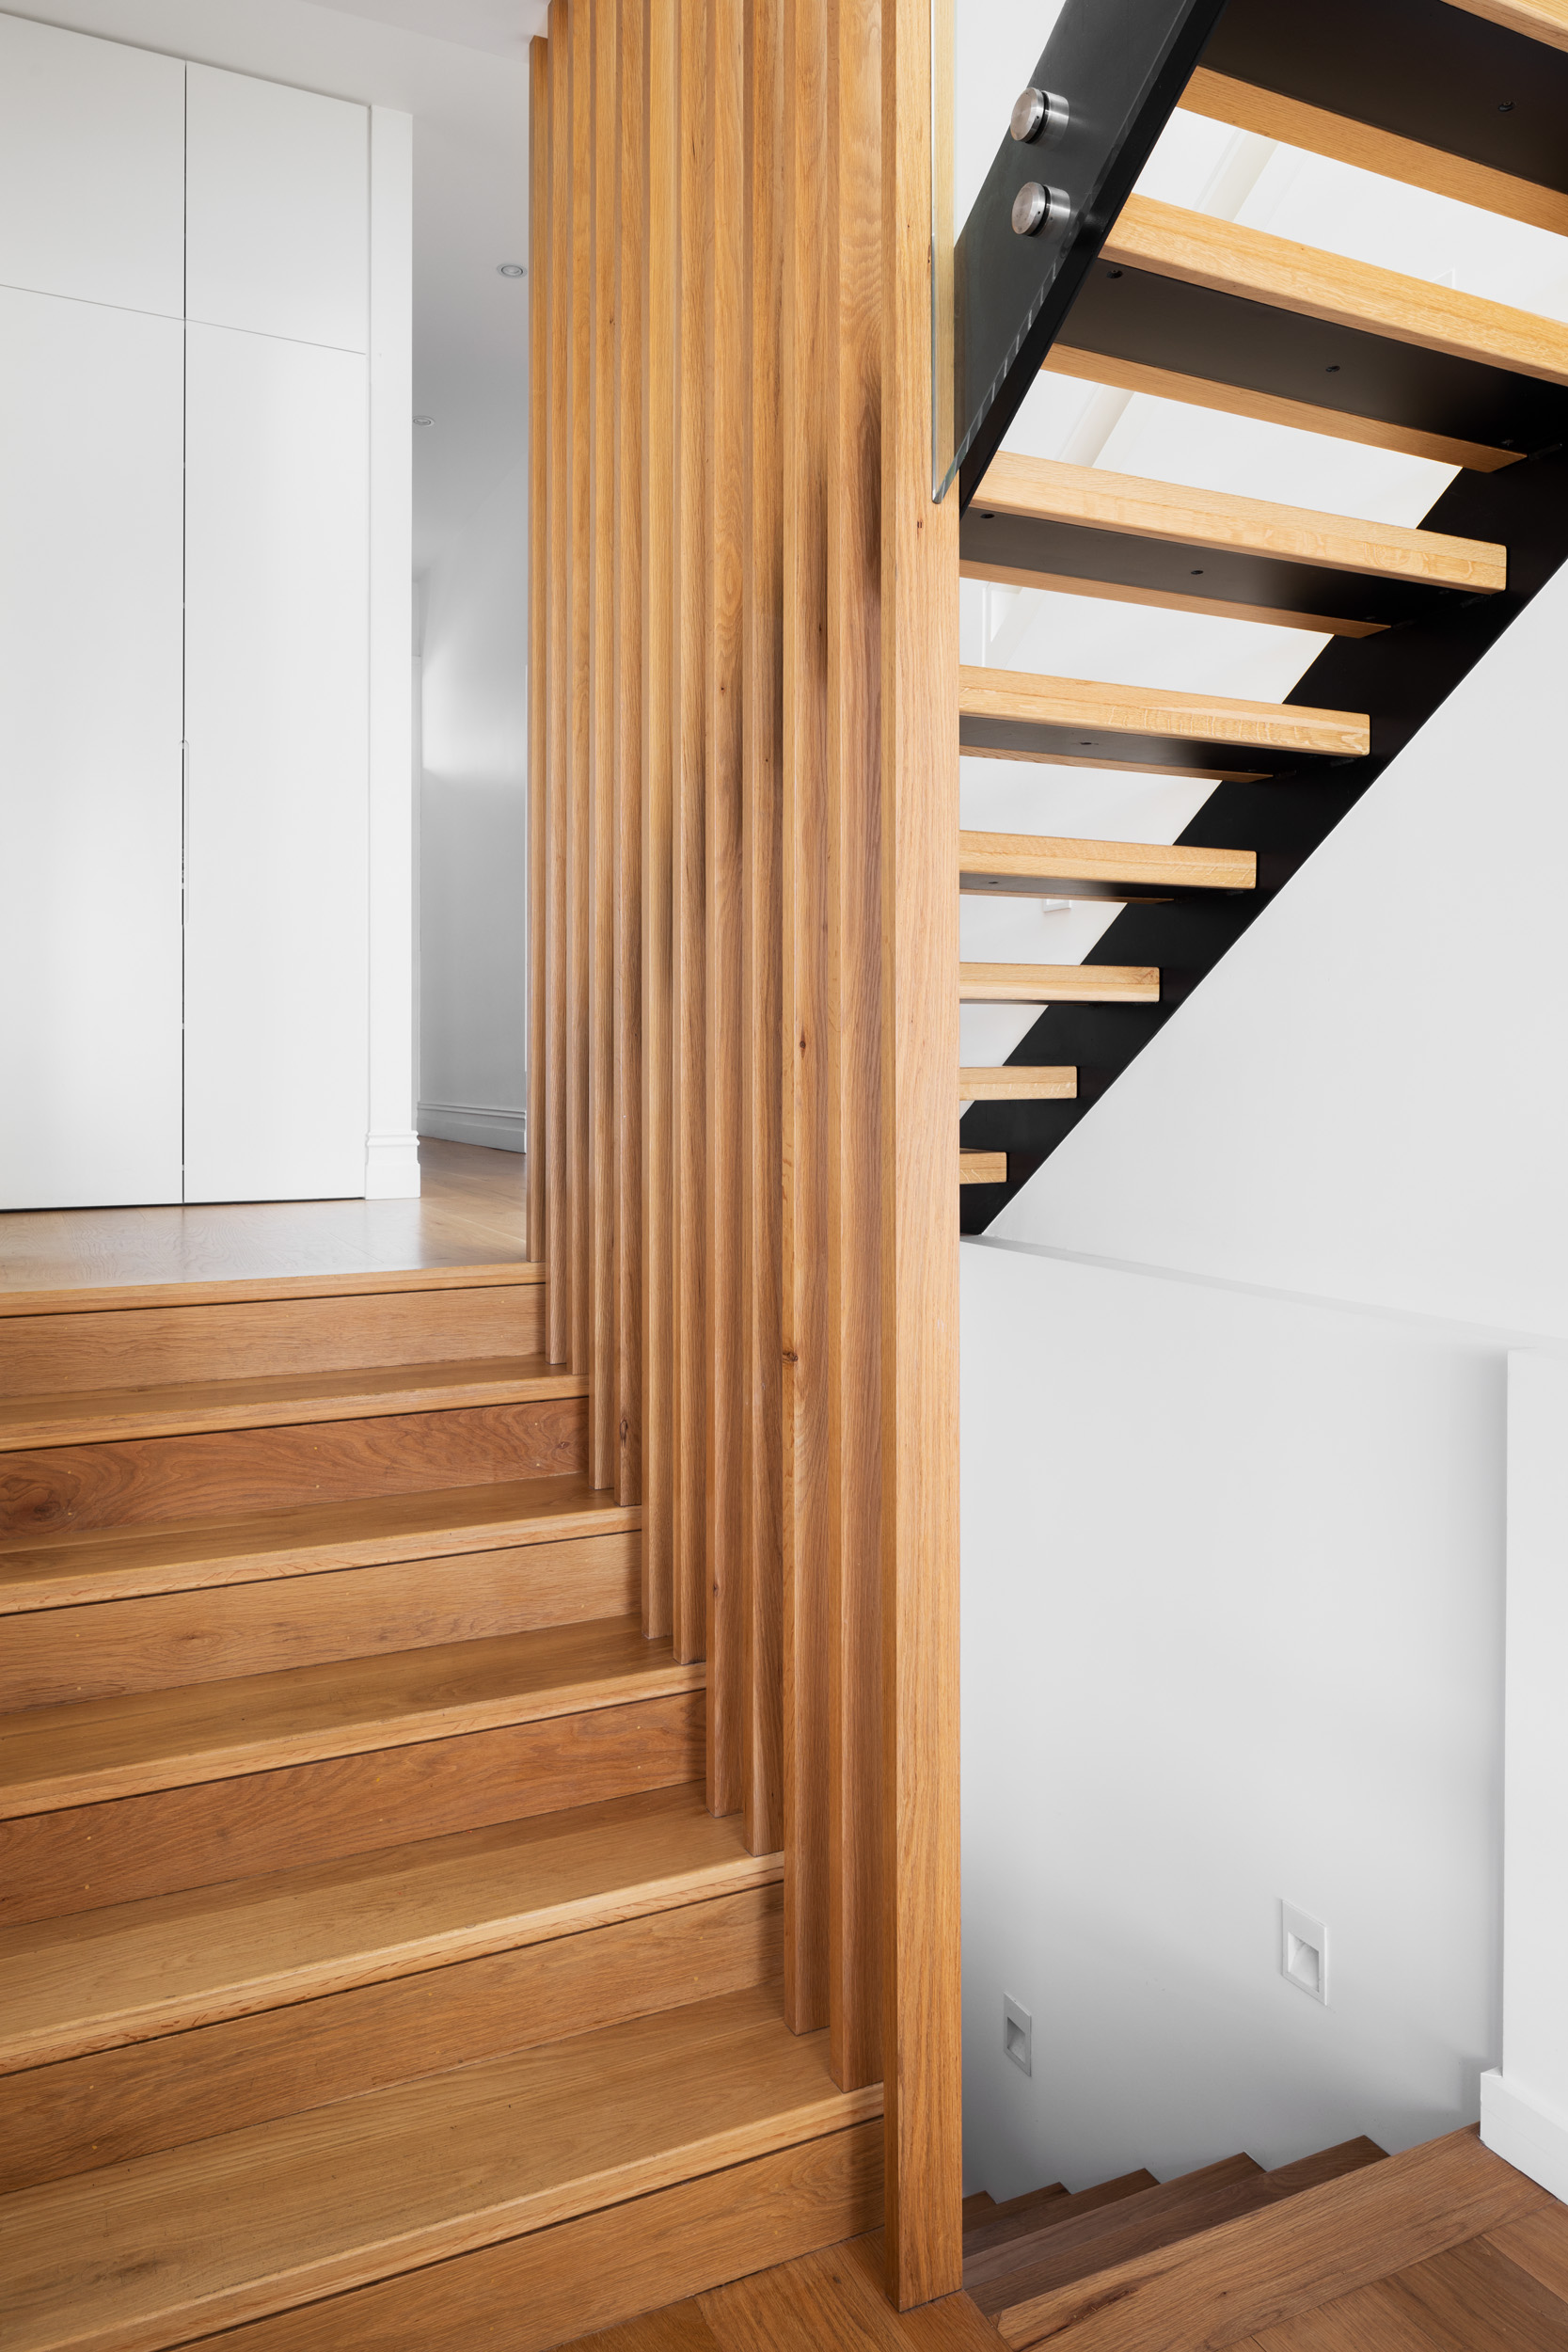 Jem_Cresswell_Architecture_Residential_Photographer_Sydney_Australia_020.jpg